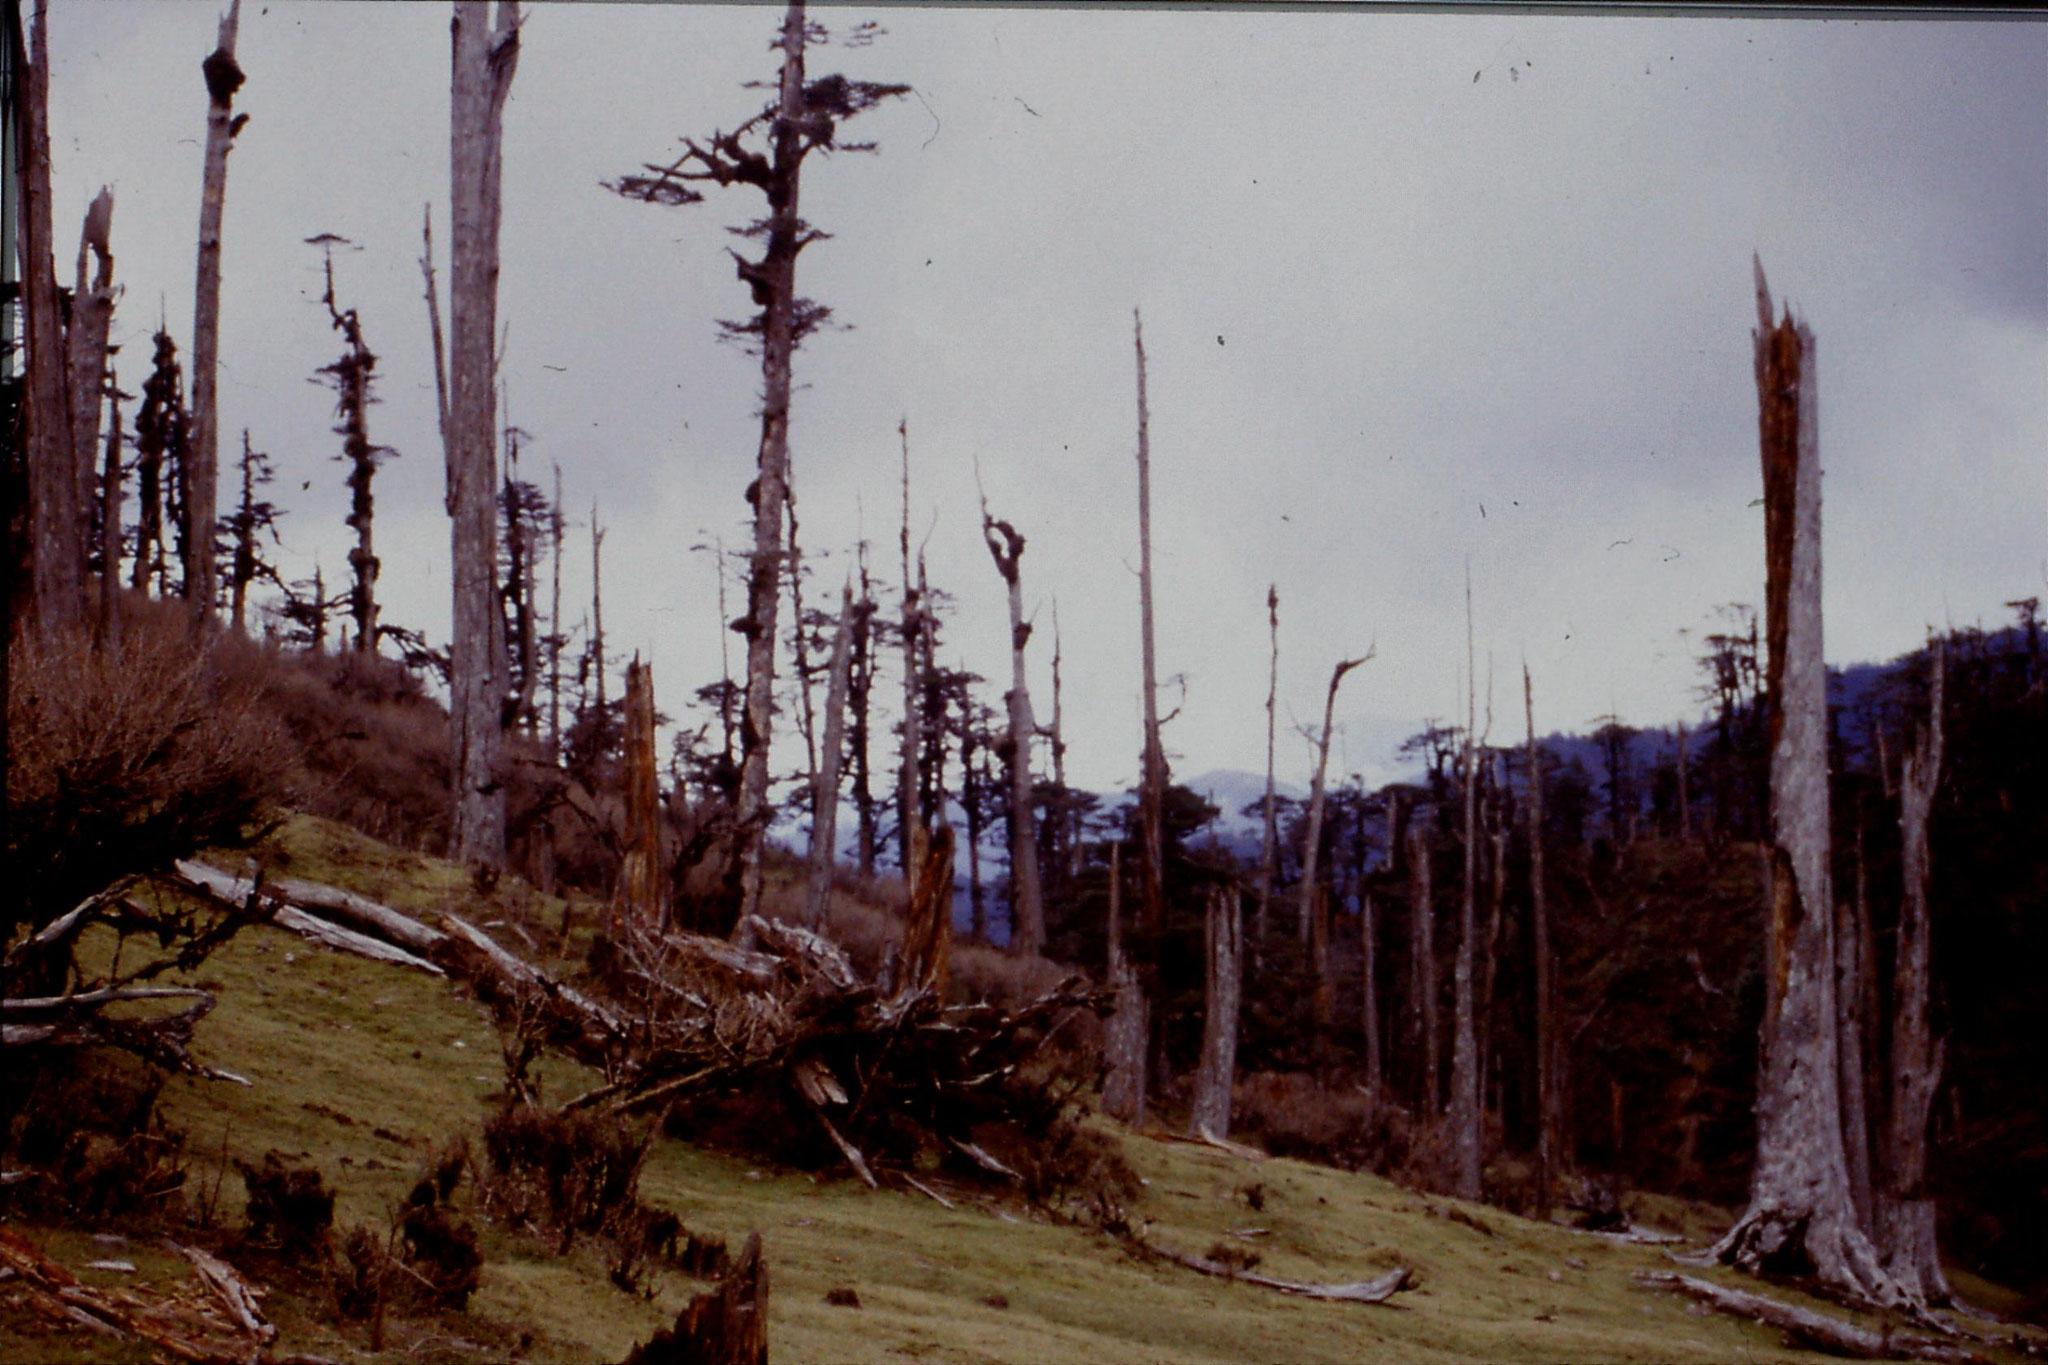 7/5/1990: 18: dead trees